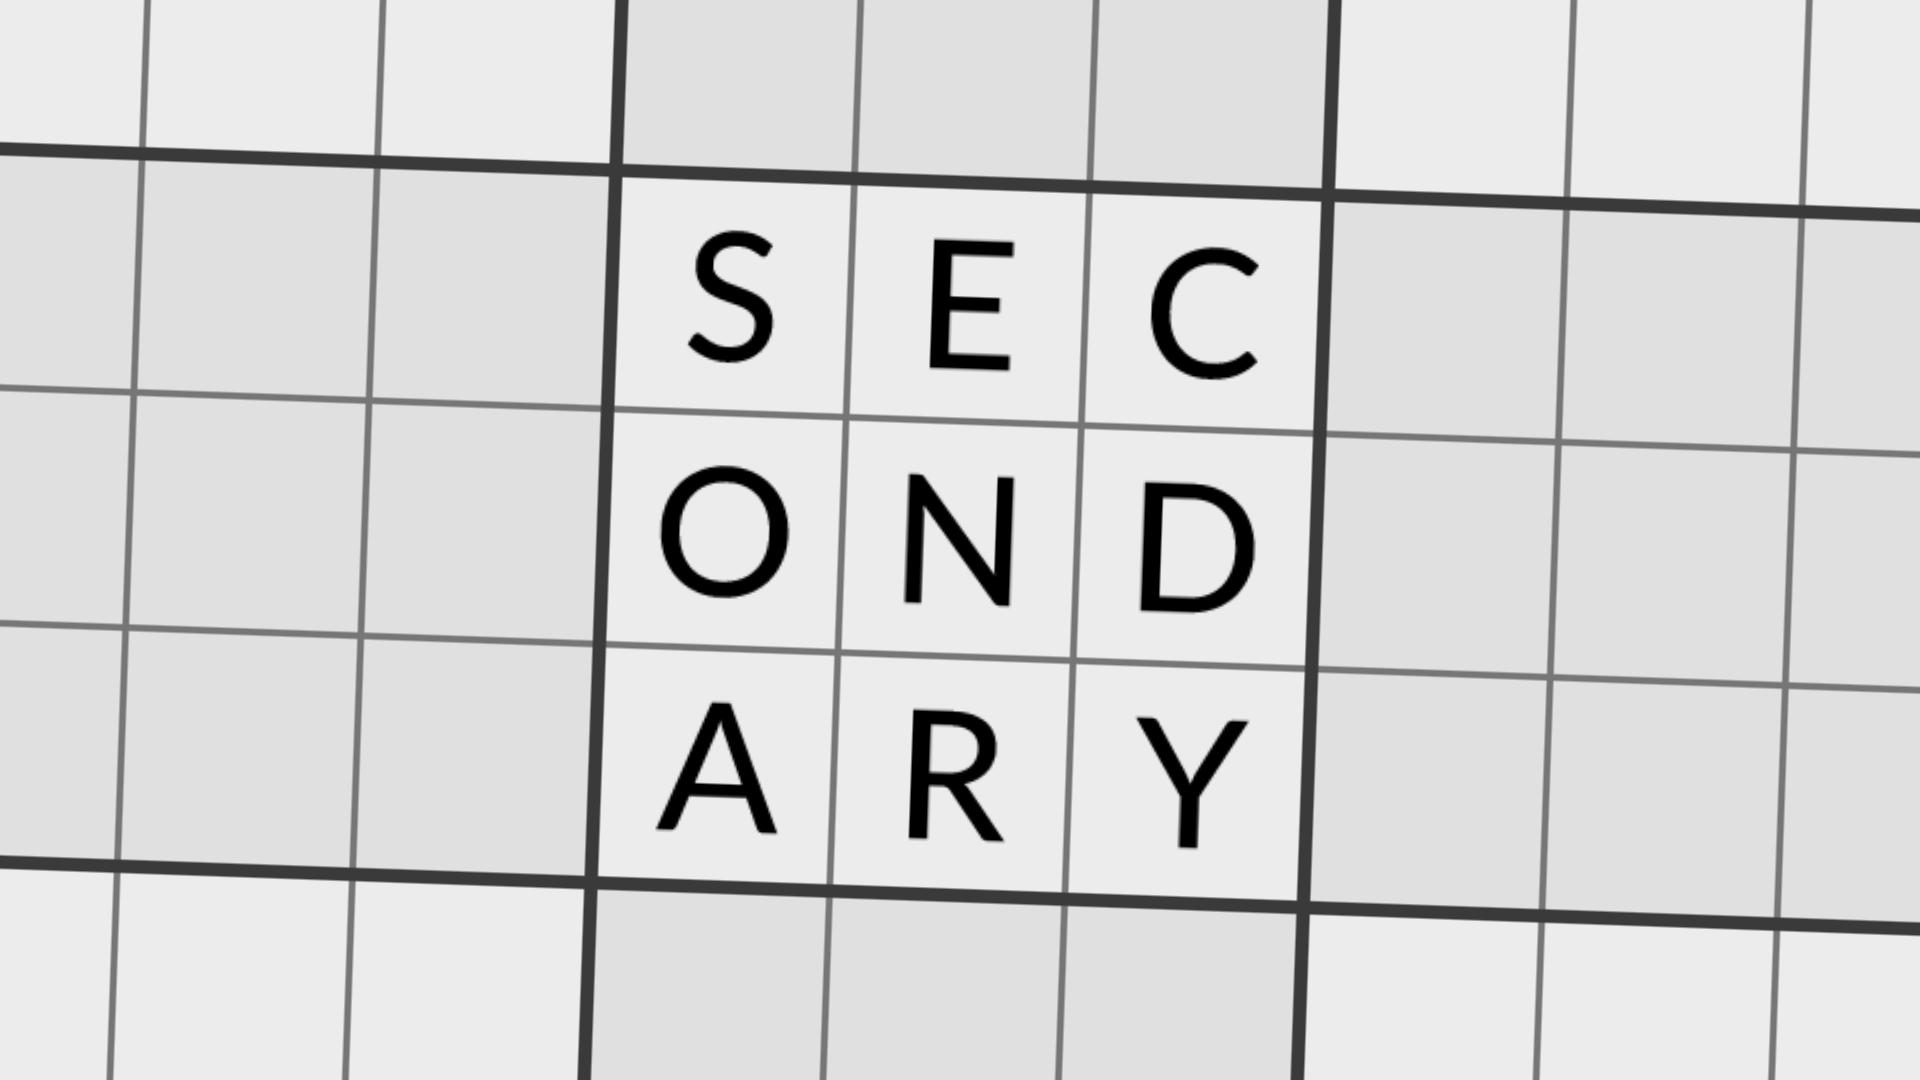 Secondary Level